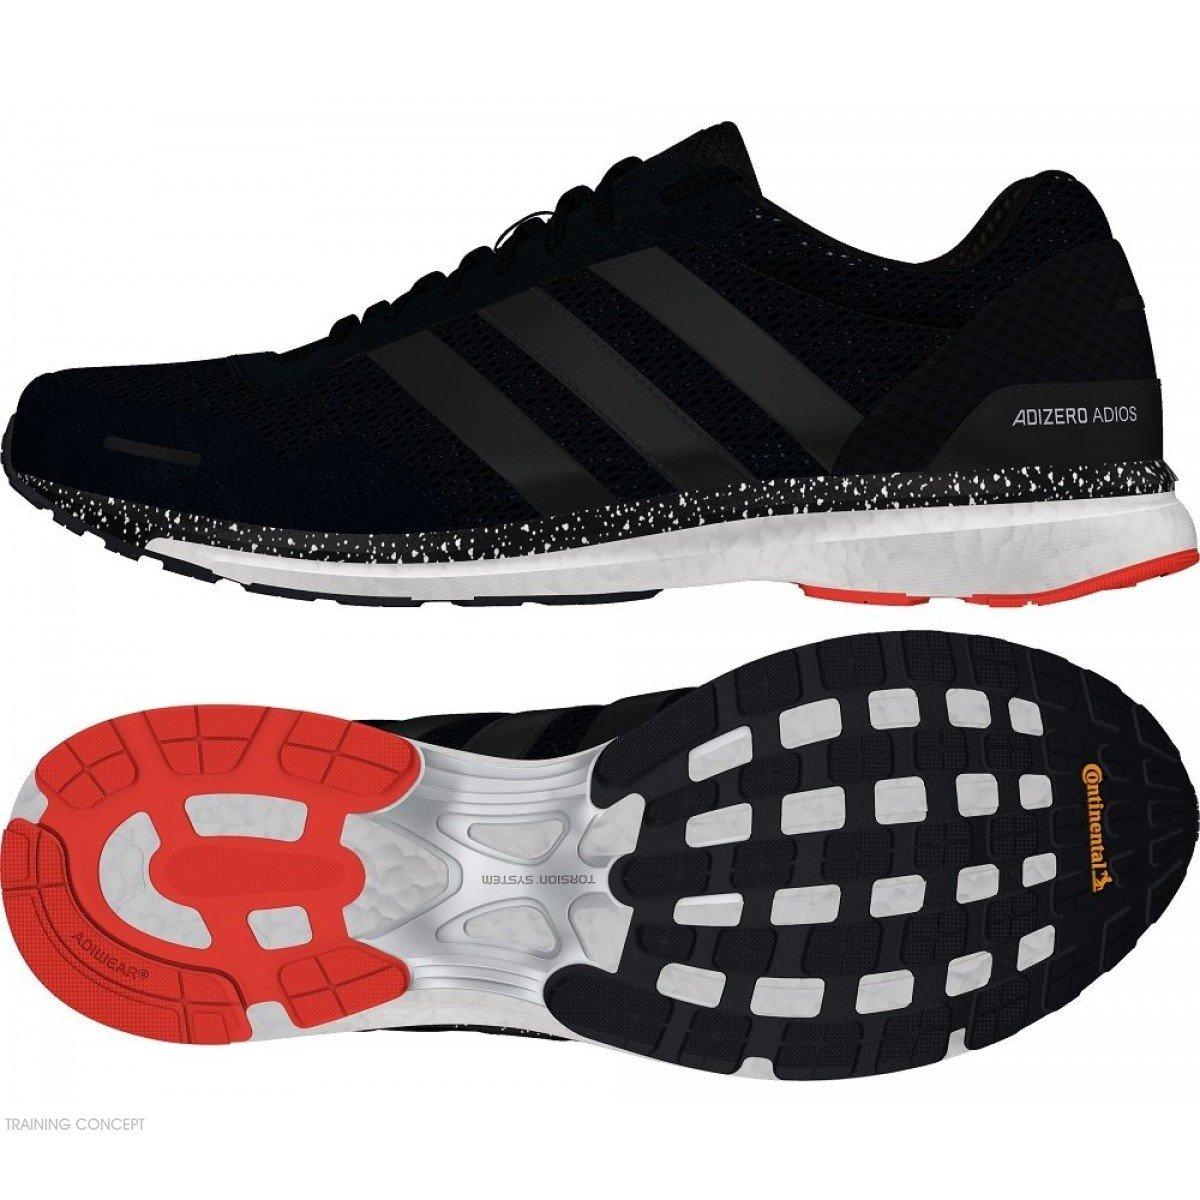 buy popular 43607 6f21d adidas adizero adios boost cm8356